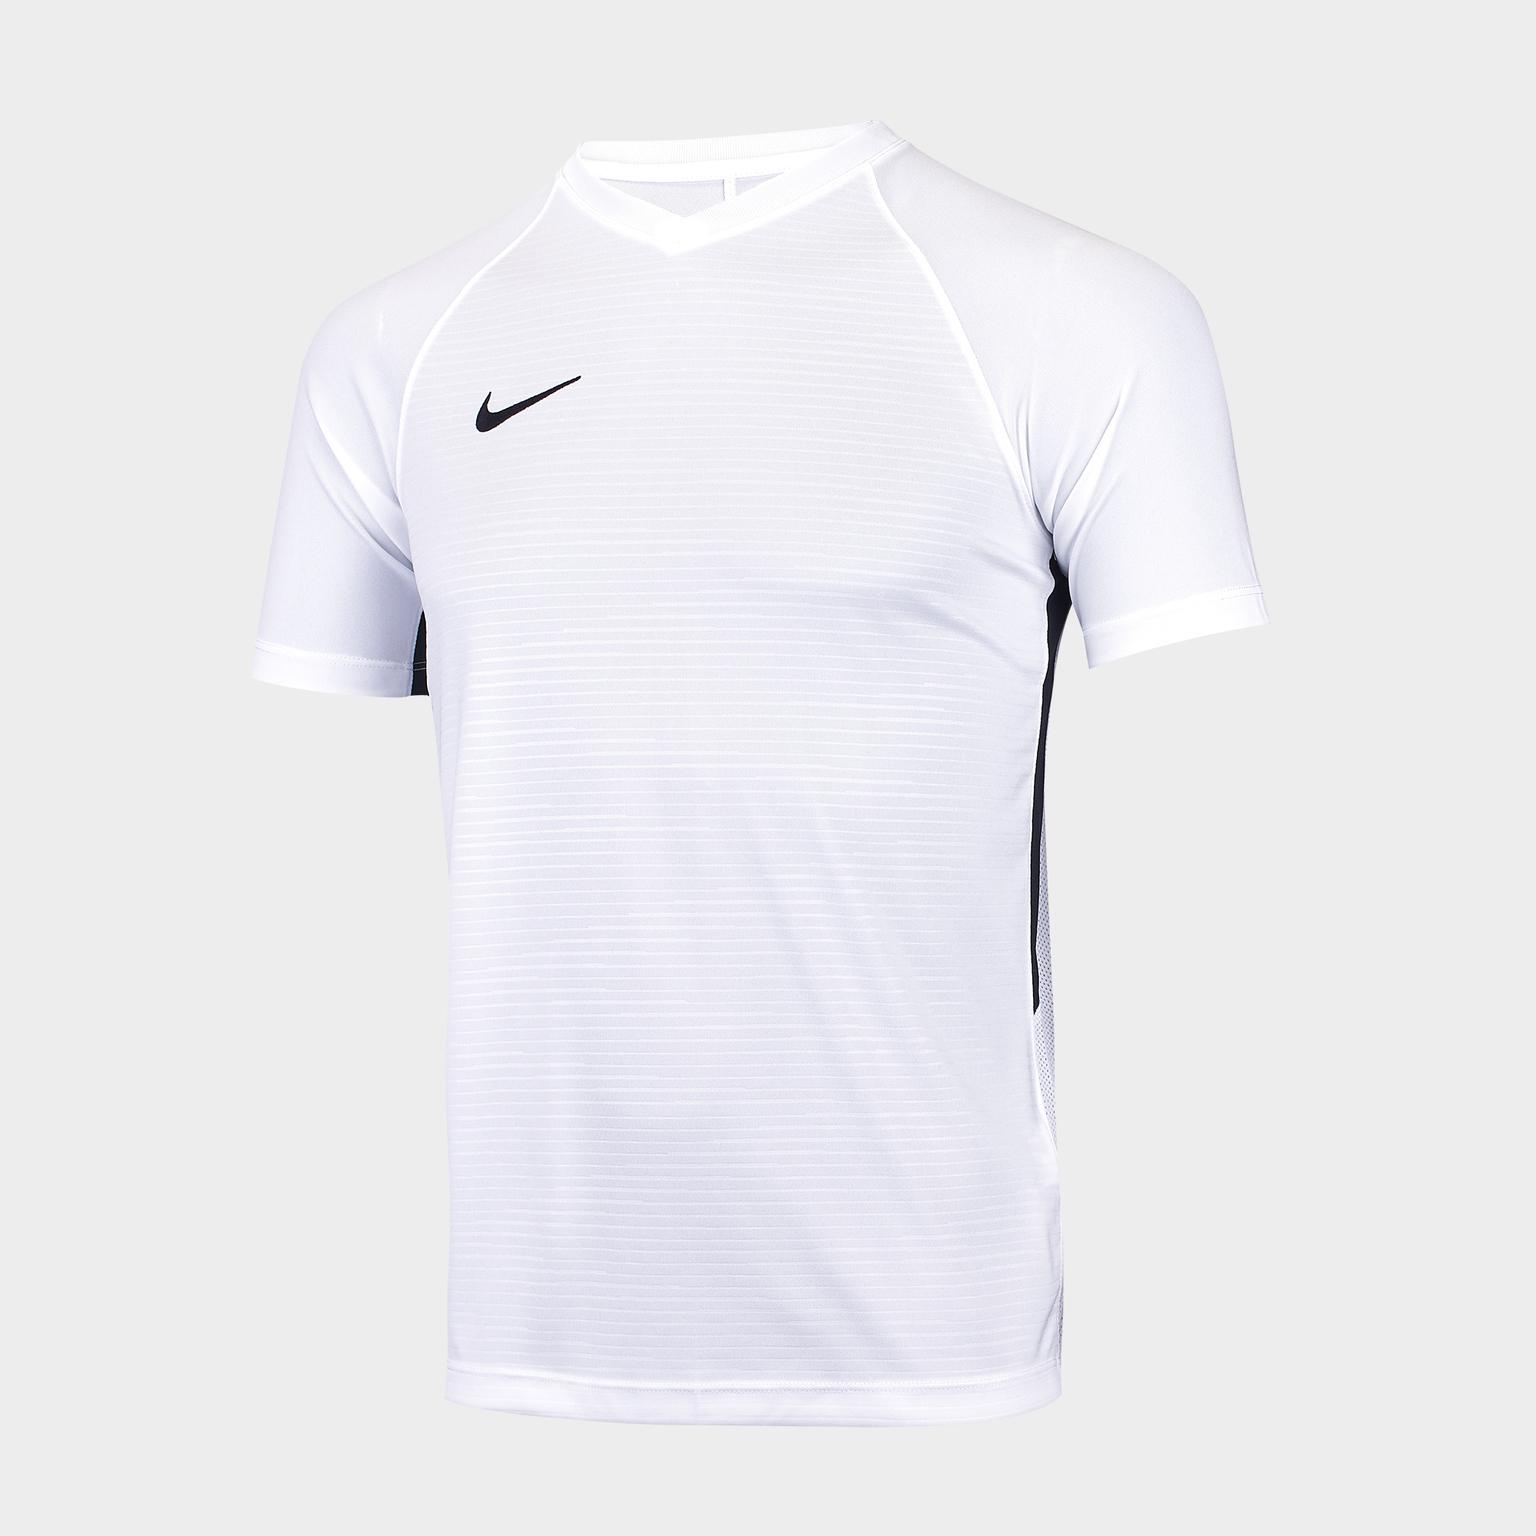 Футболка детская Nike Dry Tiempo Premier 894111-100 футболка игровая nike dry tiempo prem jsy ss 894230 411